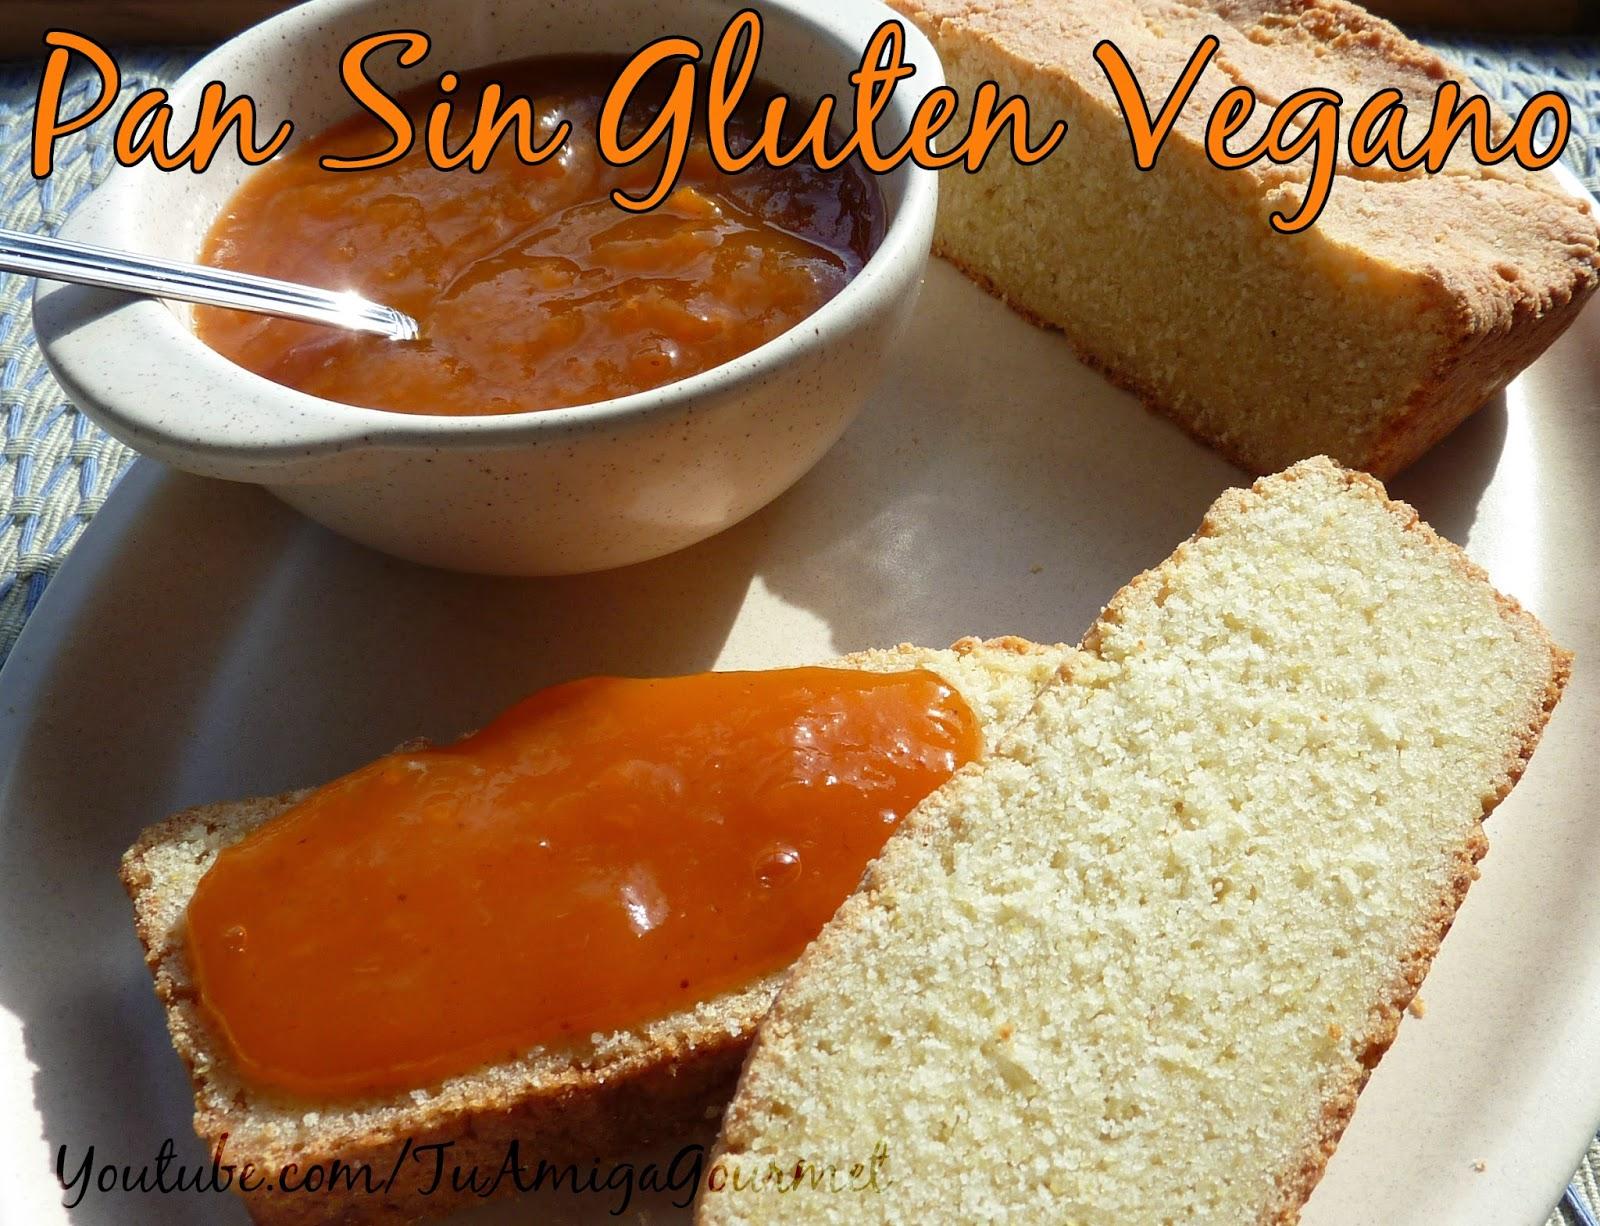 Receta: Cómo preparar un riqísimo Pan Vegano 4 harinas, sin gluten